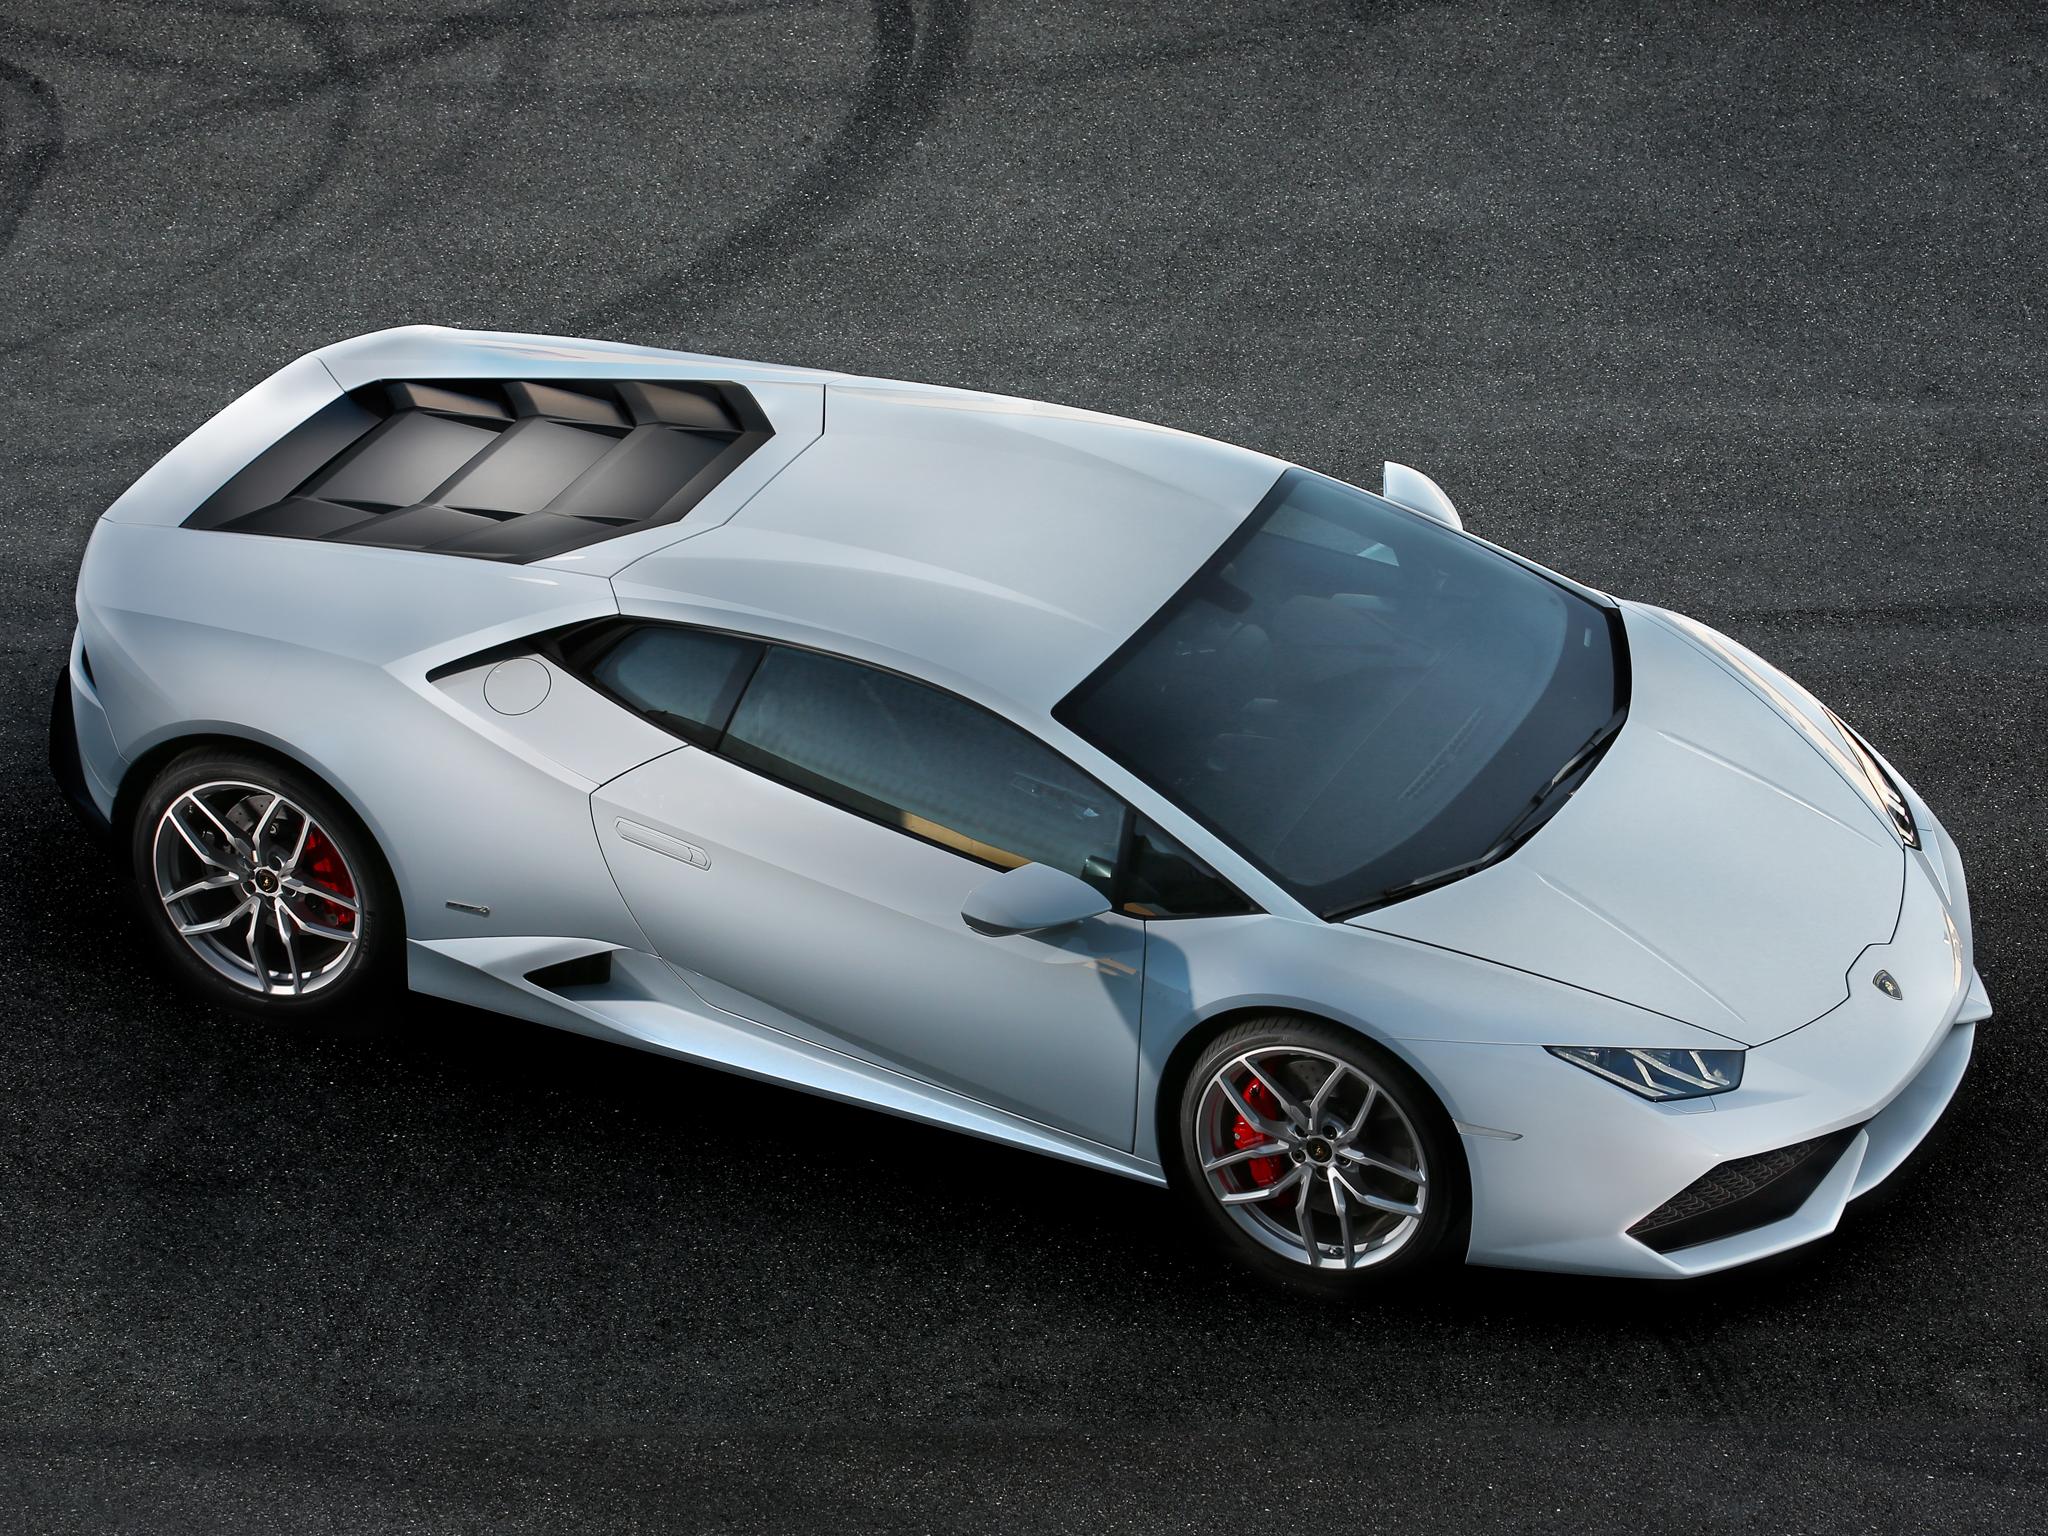 Top View: 2015 Lamborghini Huracán LP 610-4